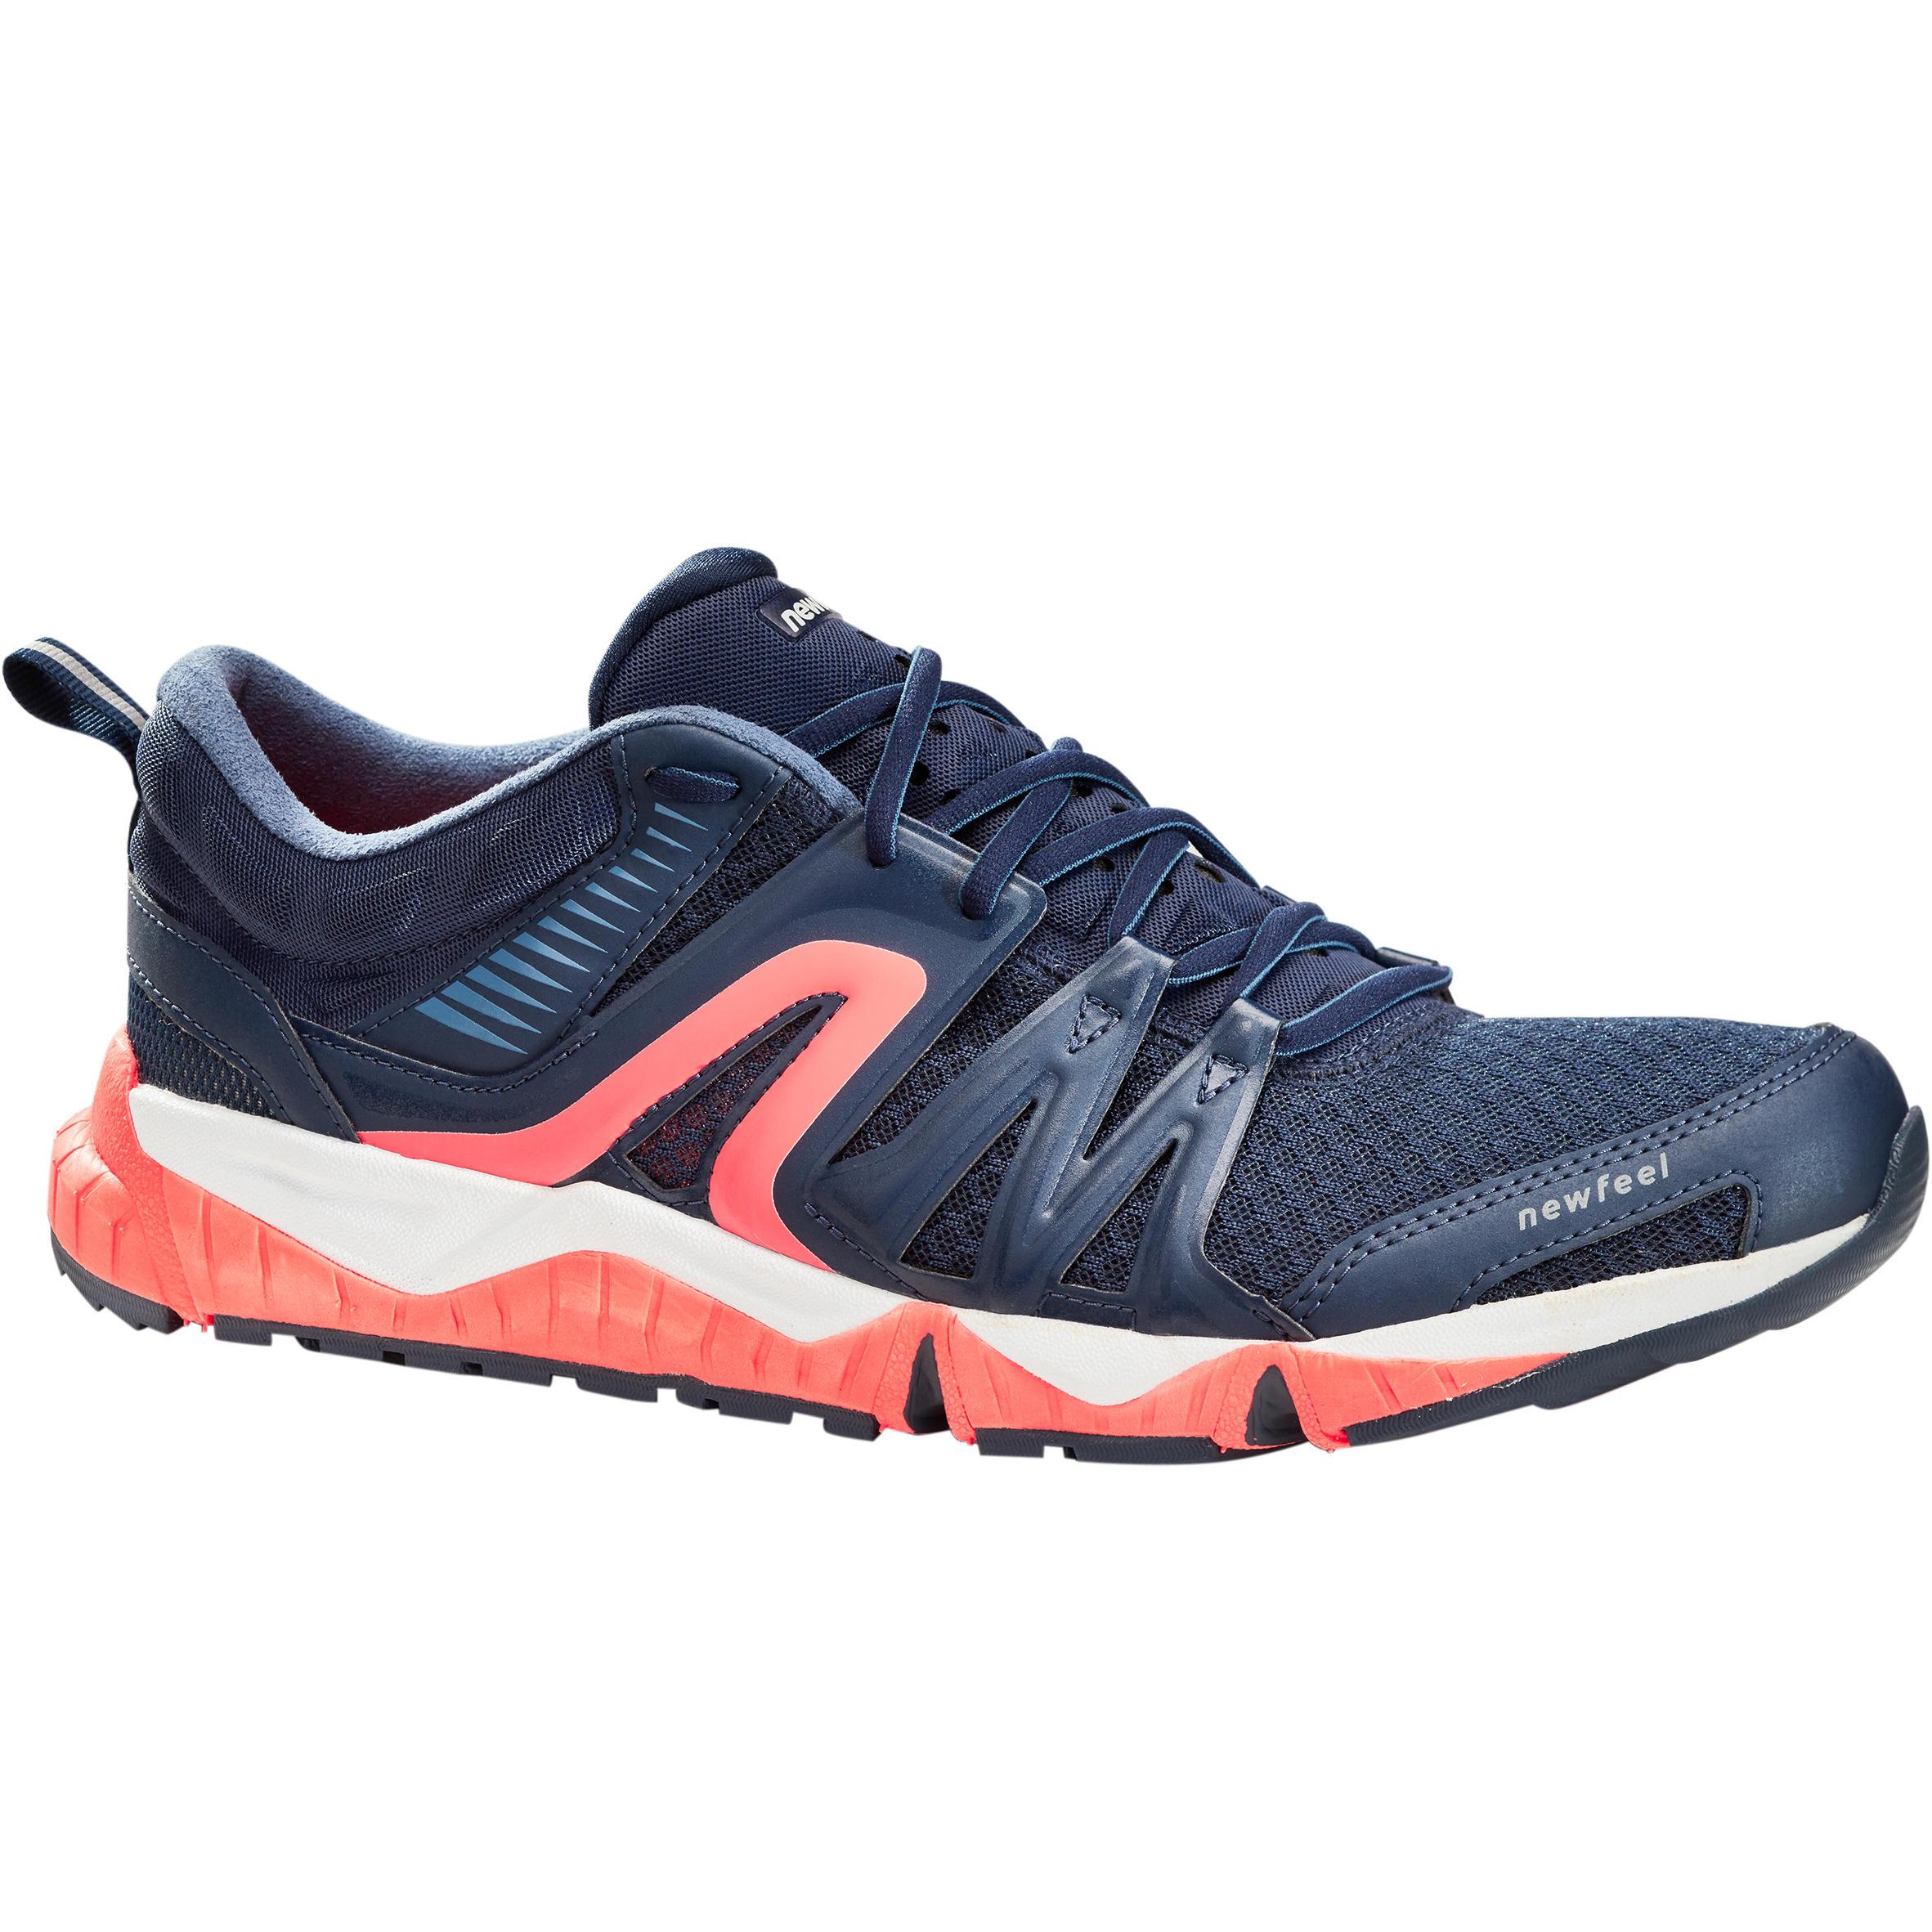 finest selection 7ba57 29b31 Comprar Zapatillas de Caminar para Hombre Online | Decathlon